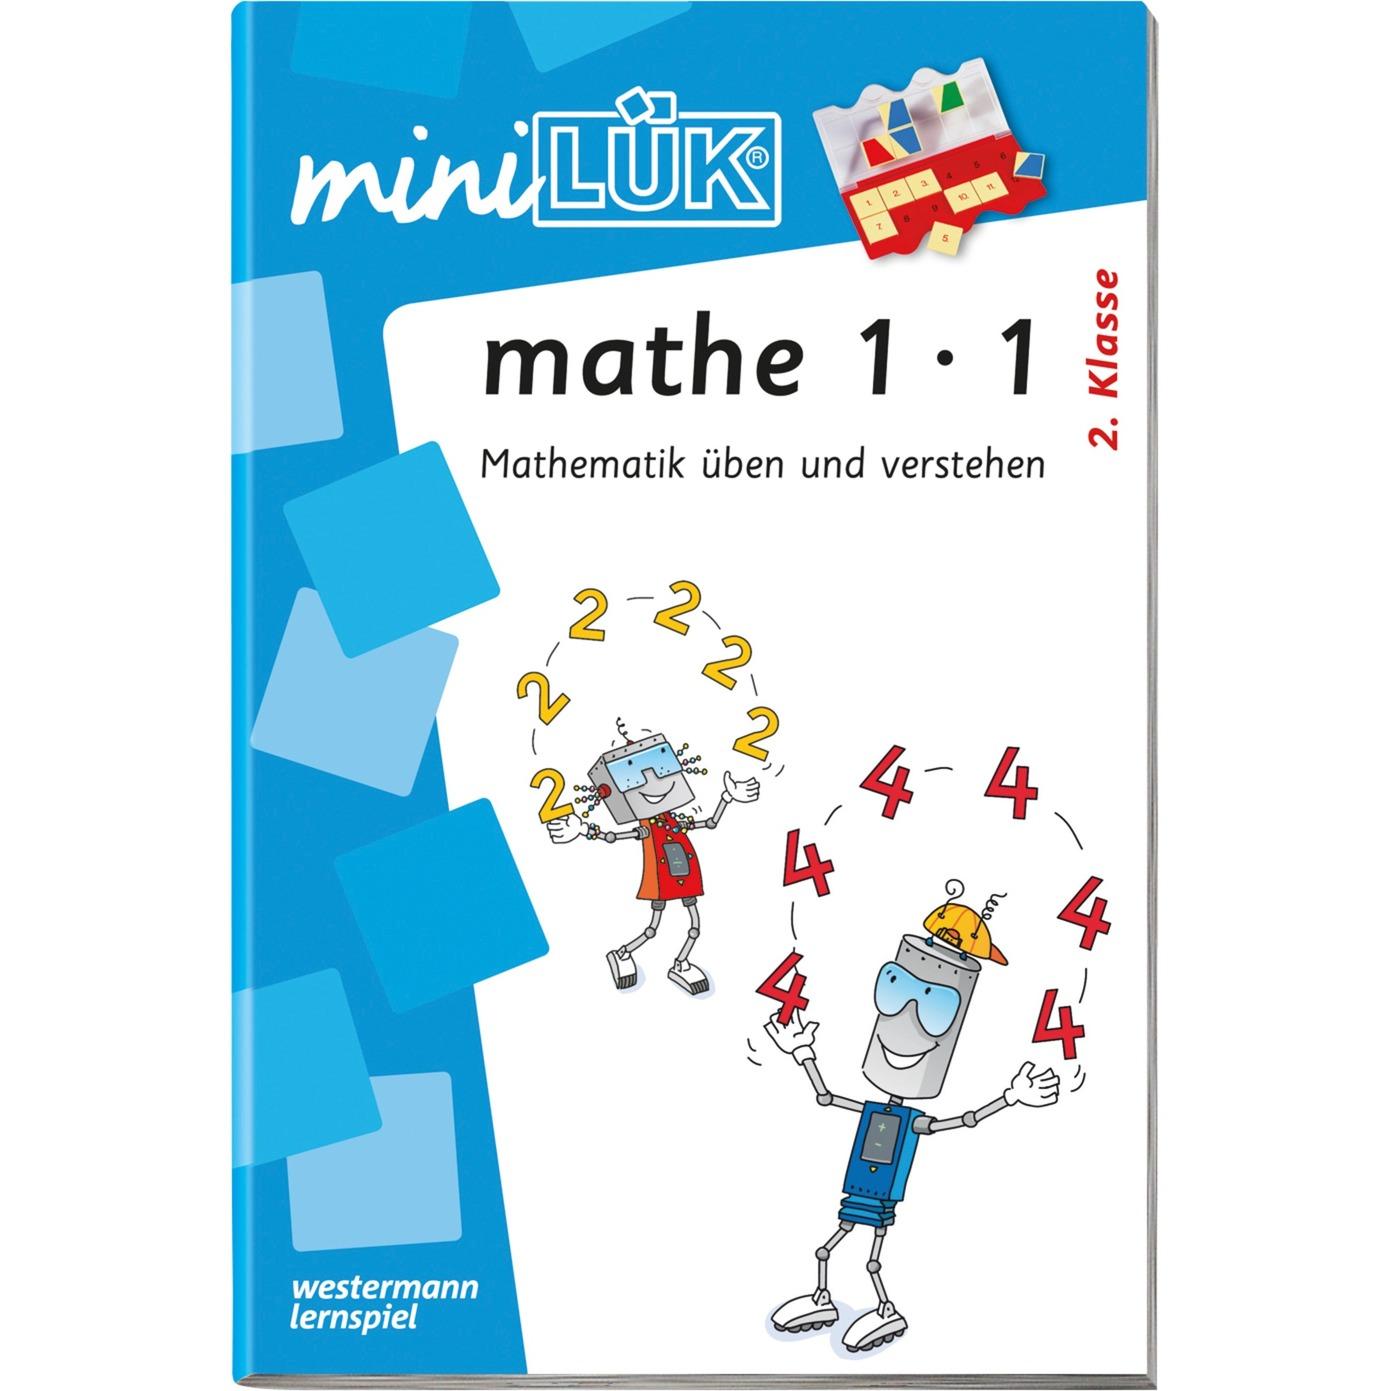 miniluek-mathe-1x1-mathematik-ueben-und-verstehen-ab-2-klasse-bornebog-bog-til-indlaring-skolebog